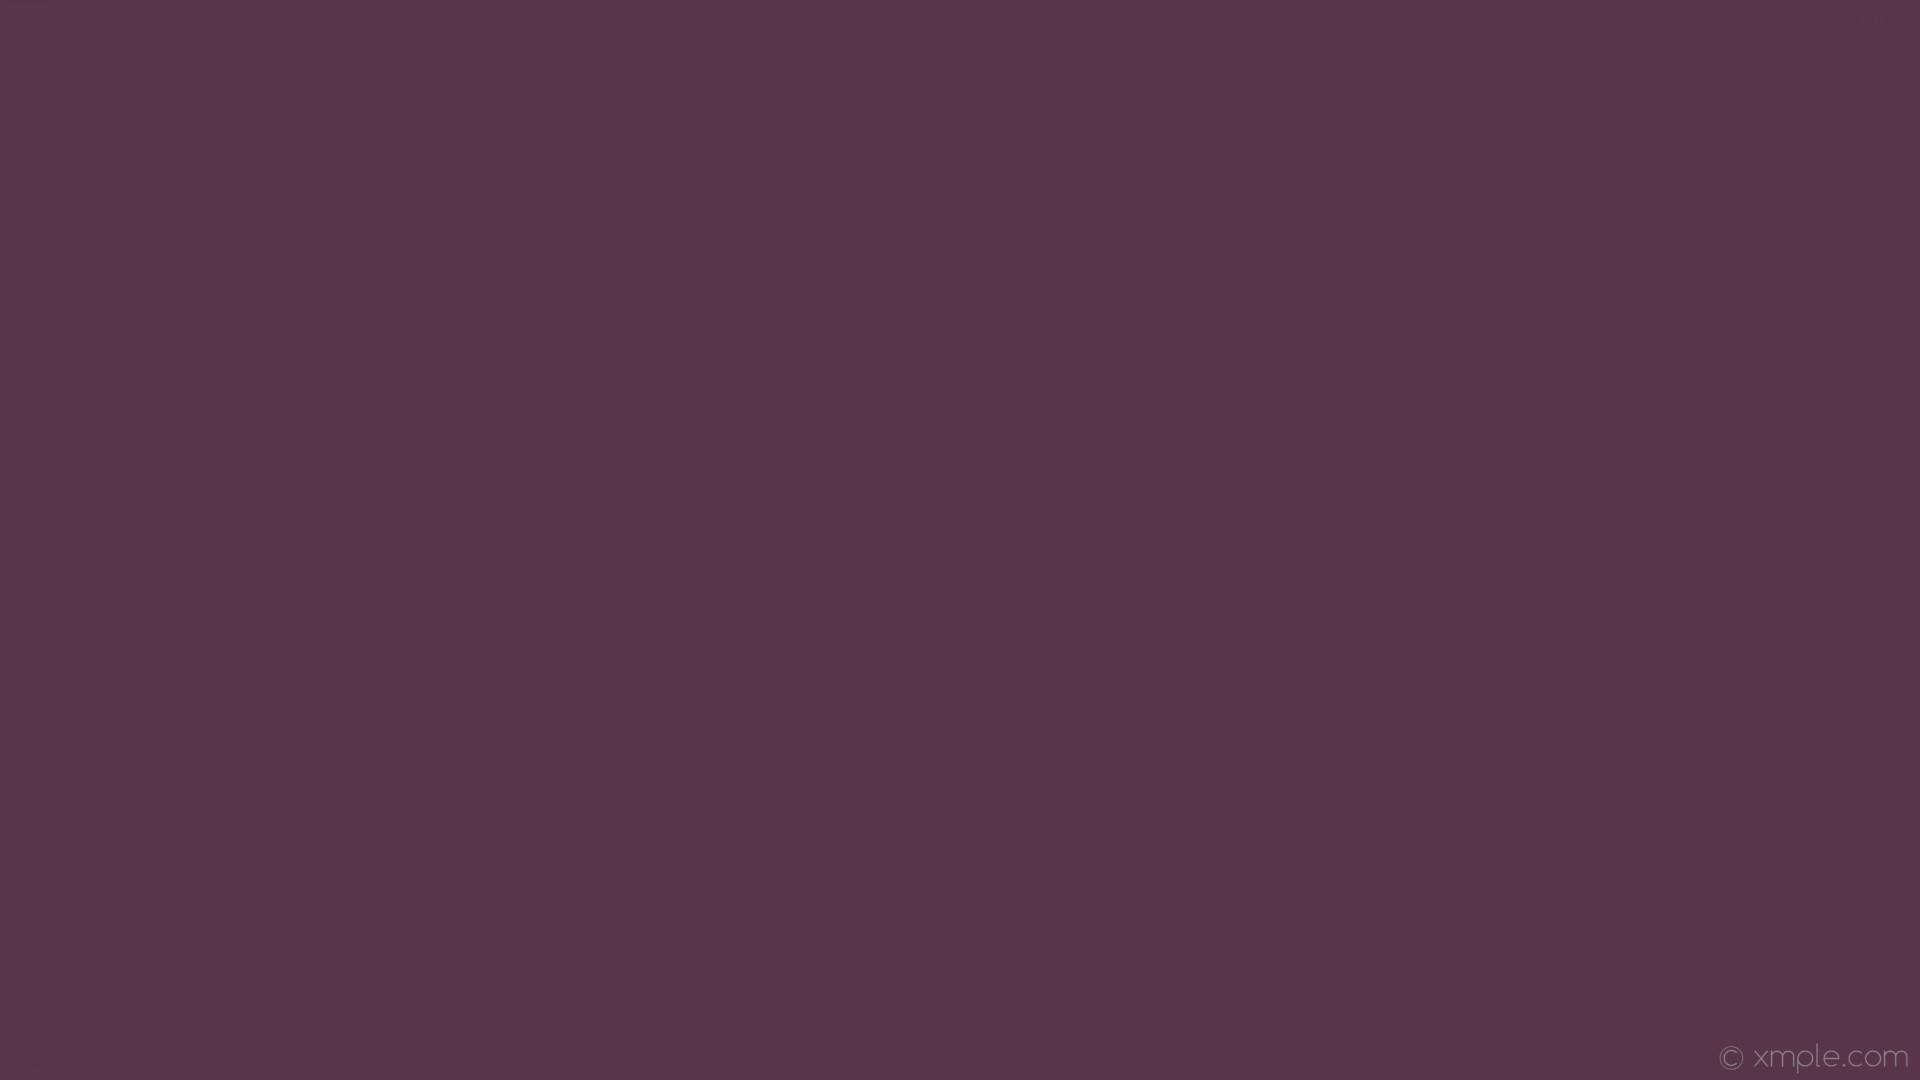 wallpaper single plain pink one colour solid color #583549